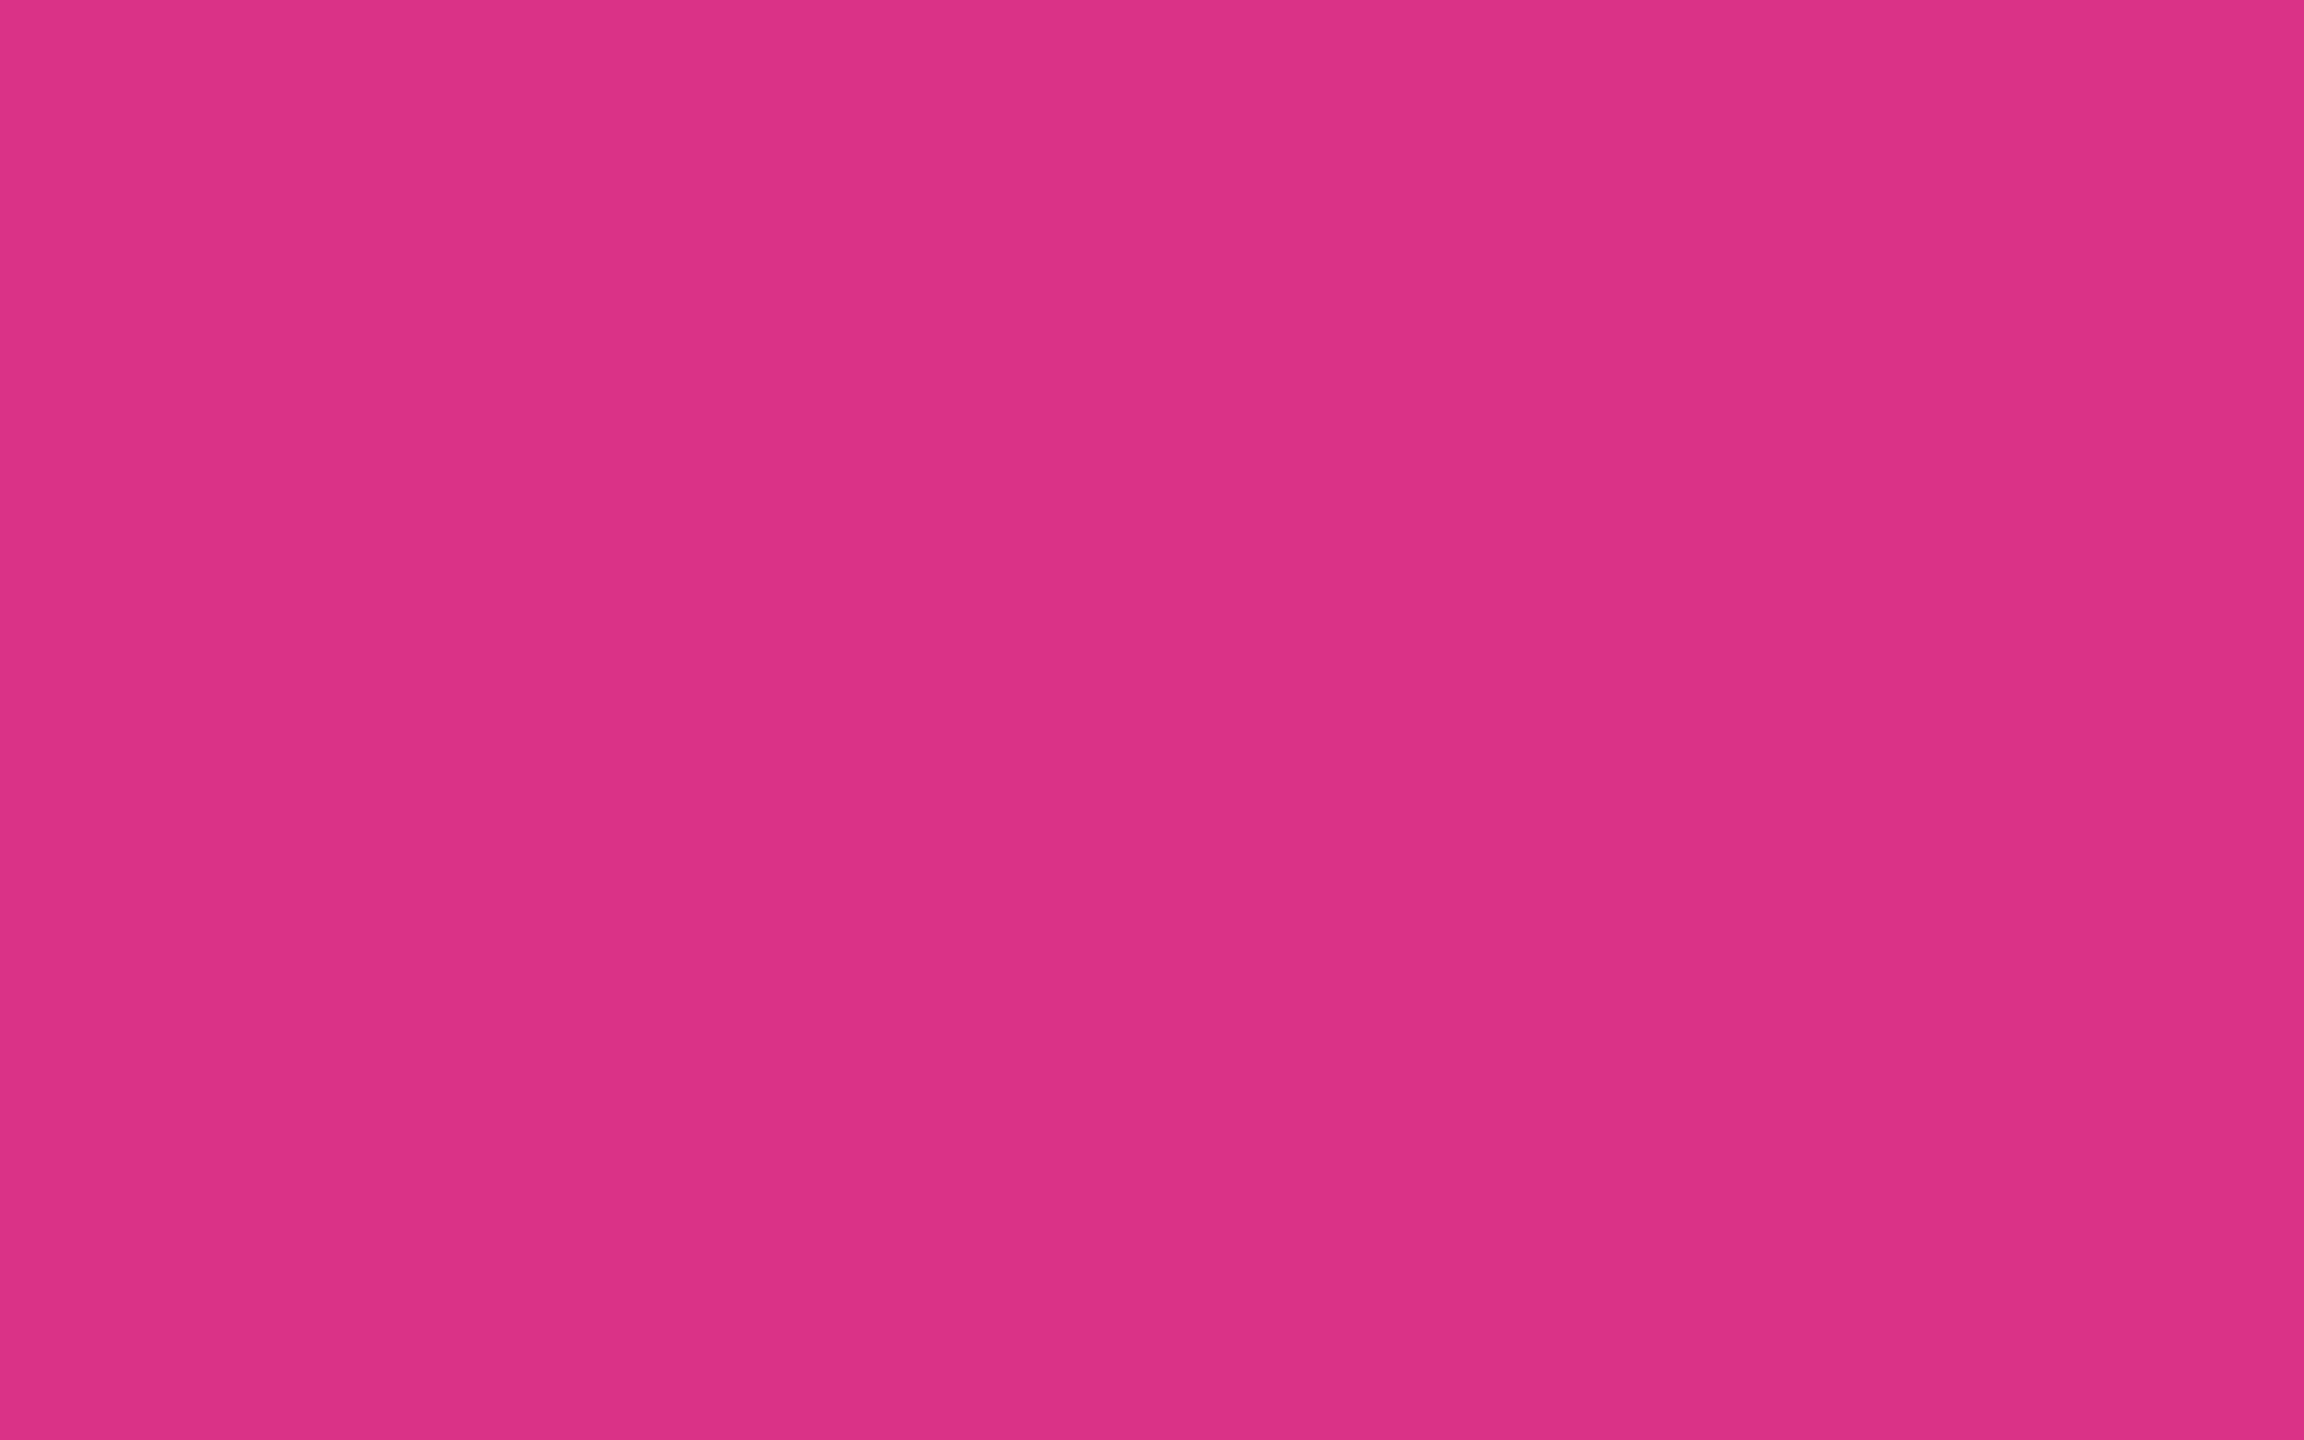 2304x1440 Deep Cerise Solid Color Background